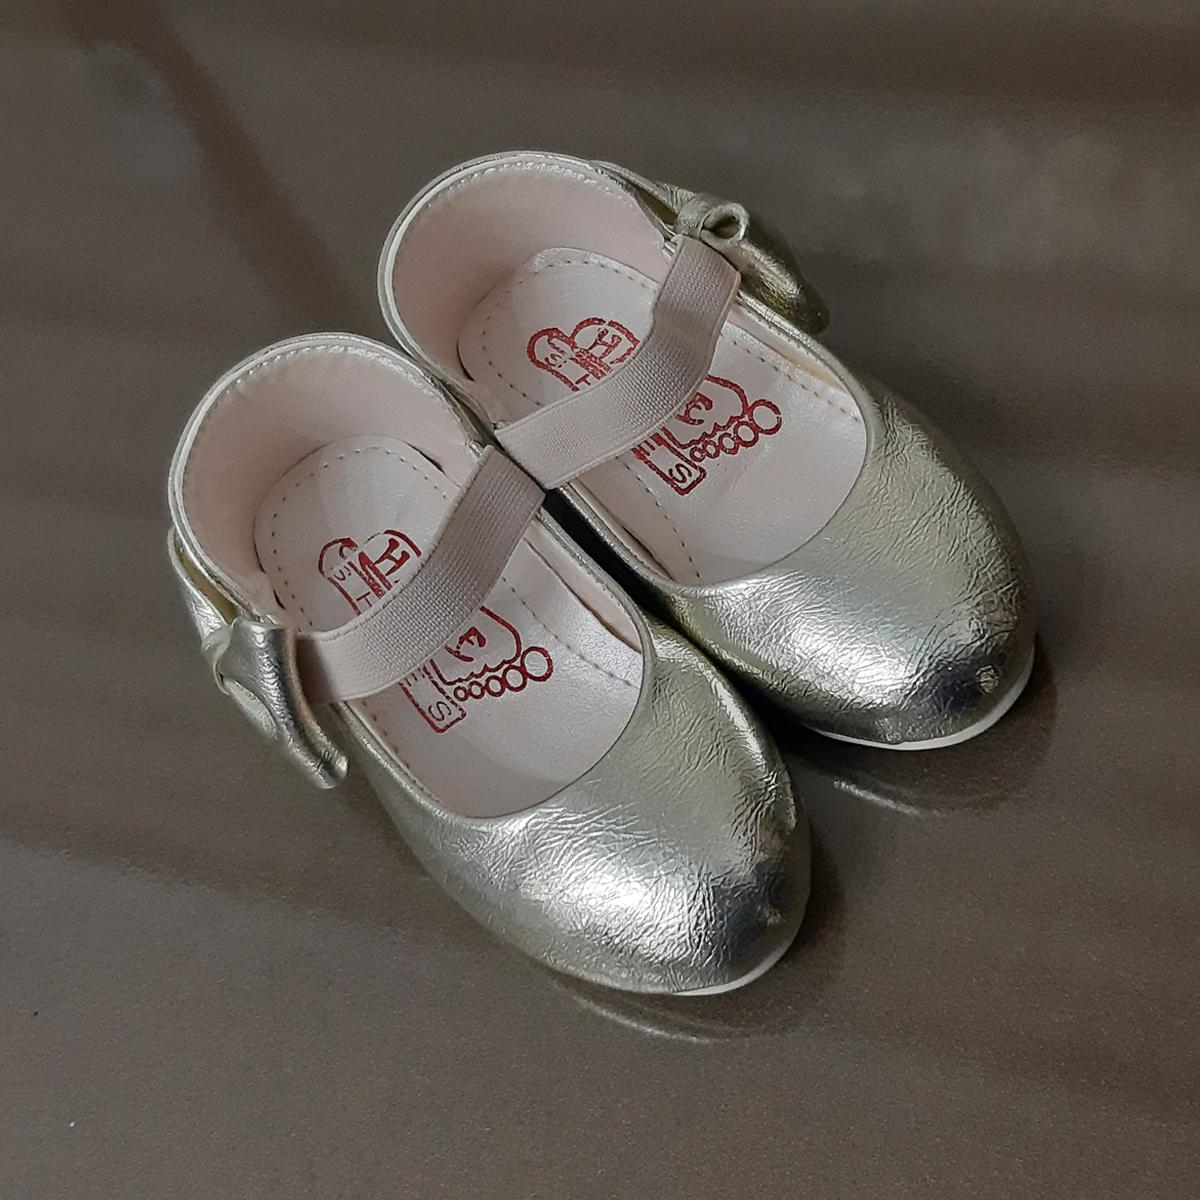 کفش دخترانه طرح پاپیون مدل 78041 -  - 3